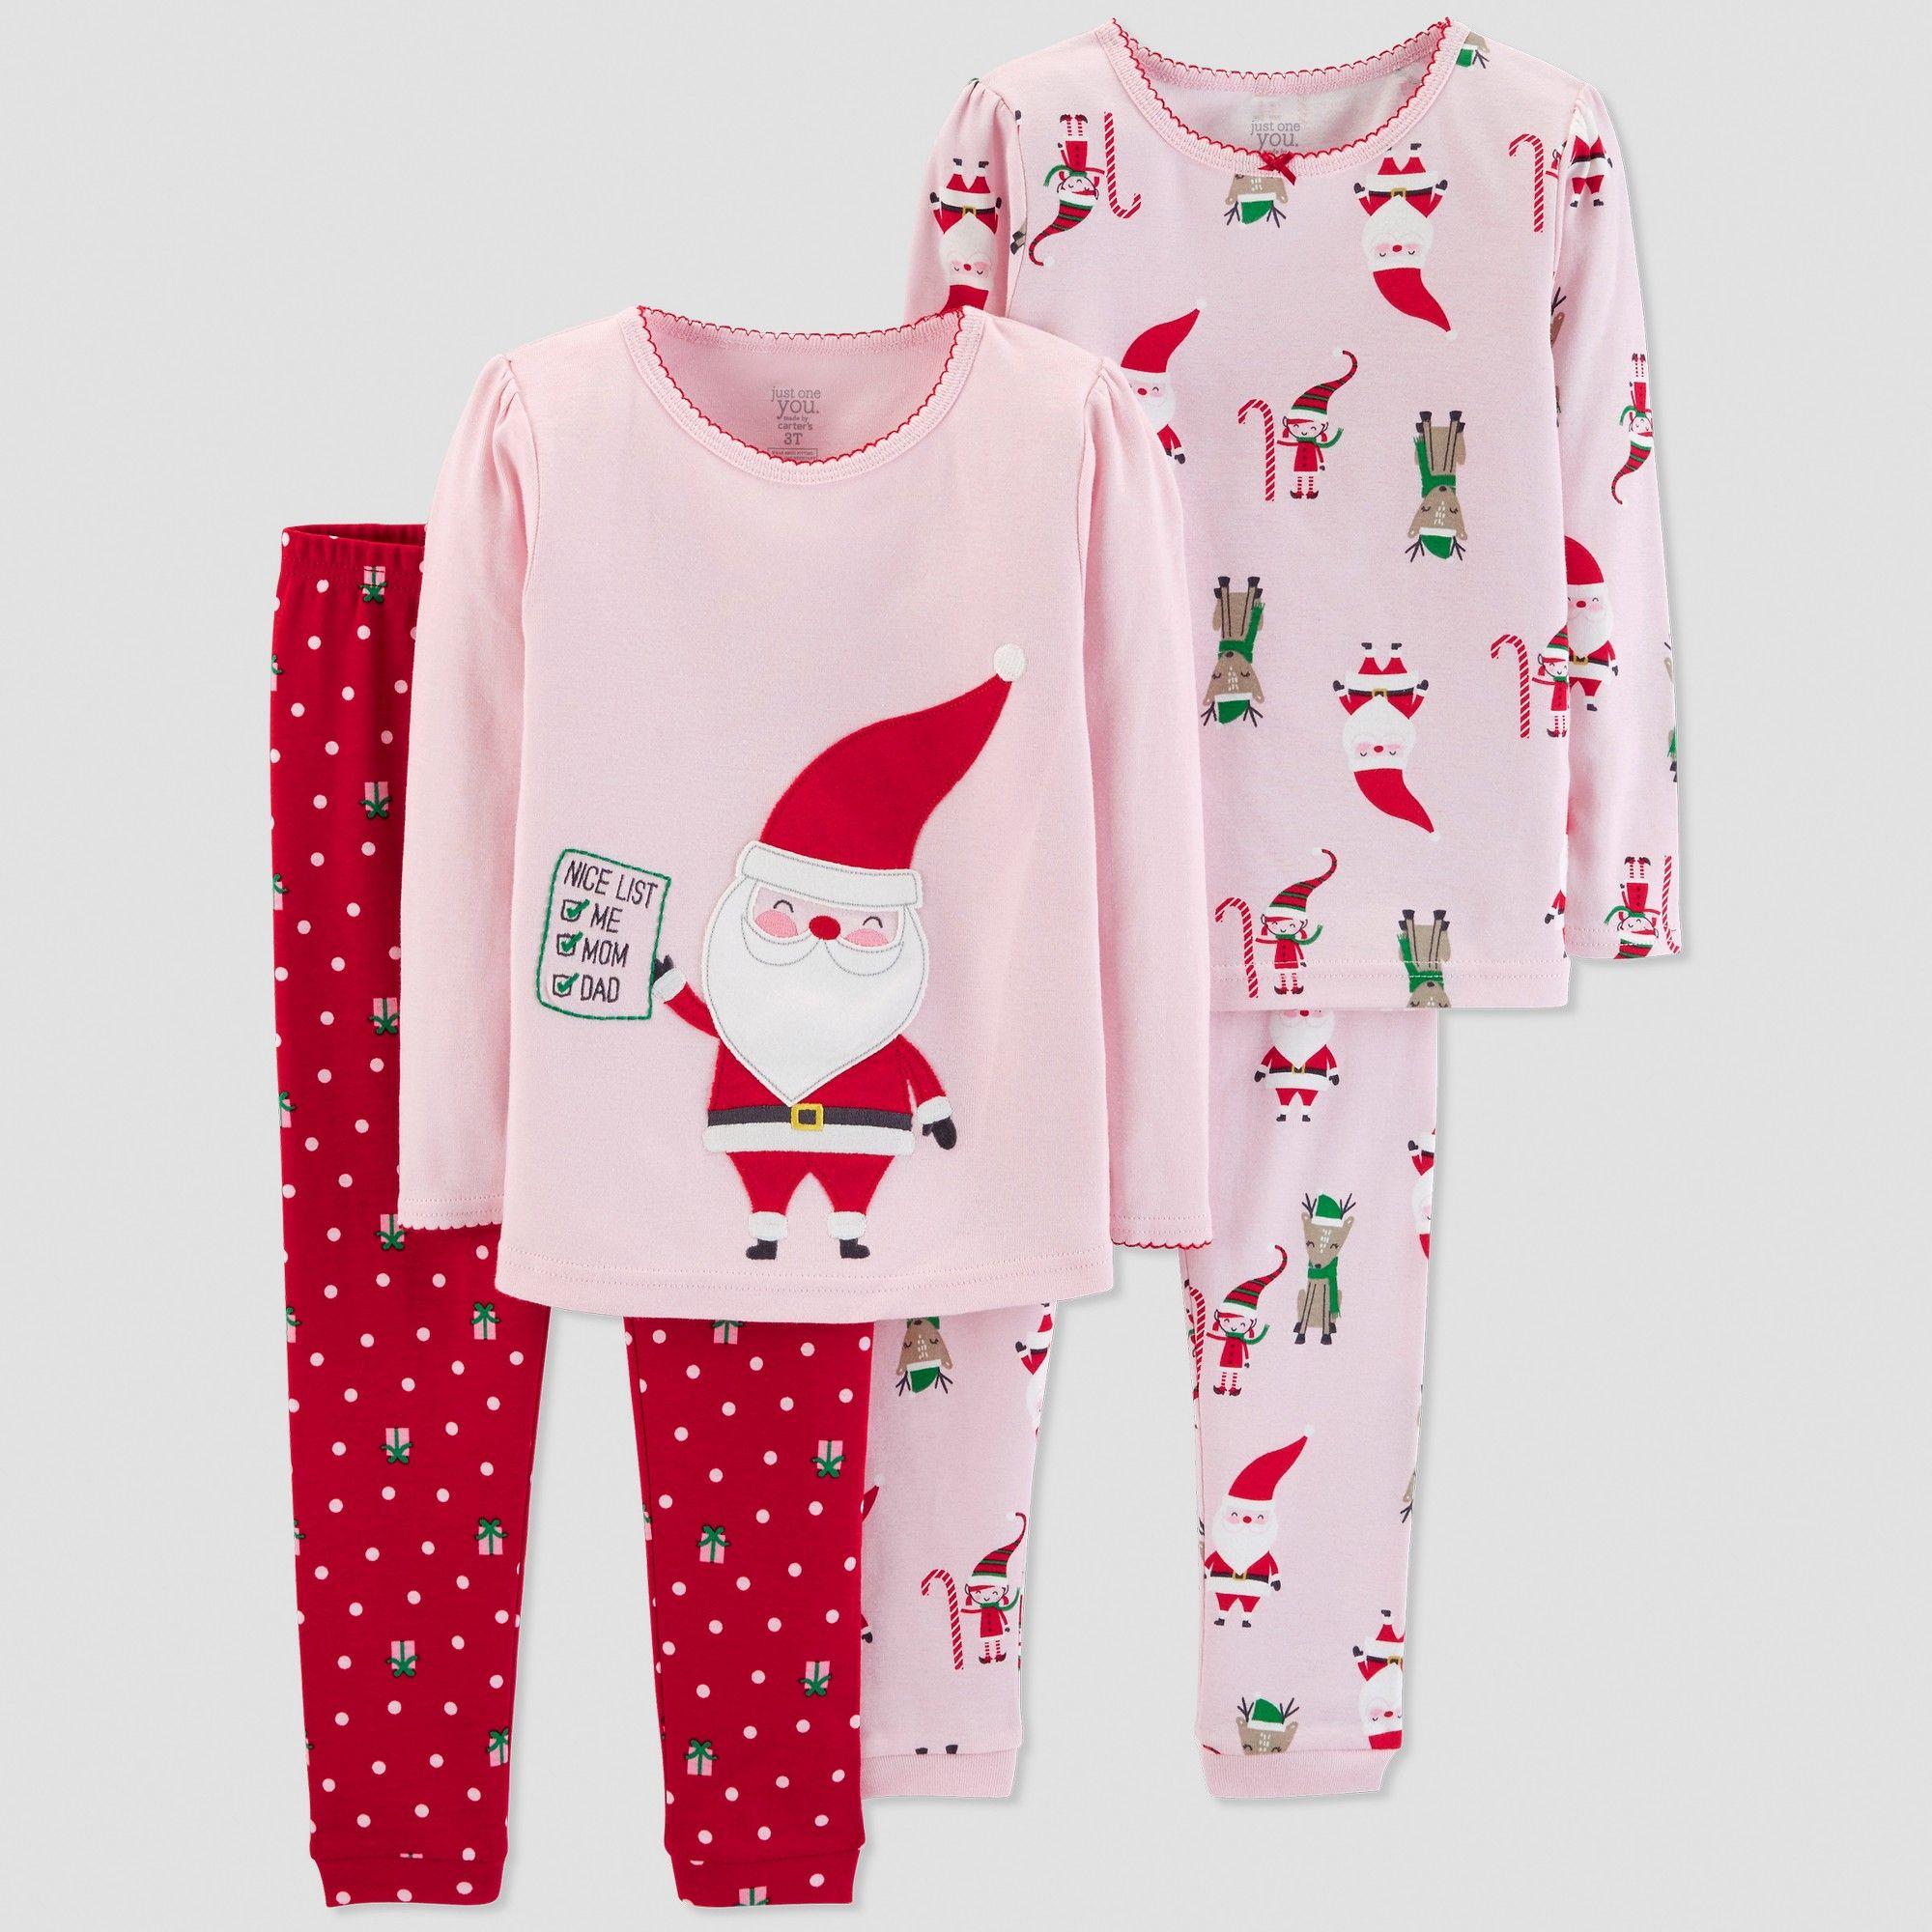 NEW Just One You Carters Pajamas Girls size 18 months Fleece Christmas Santa